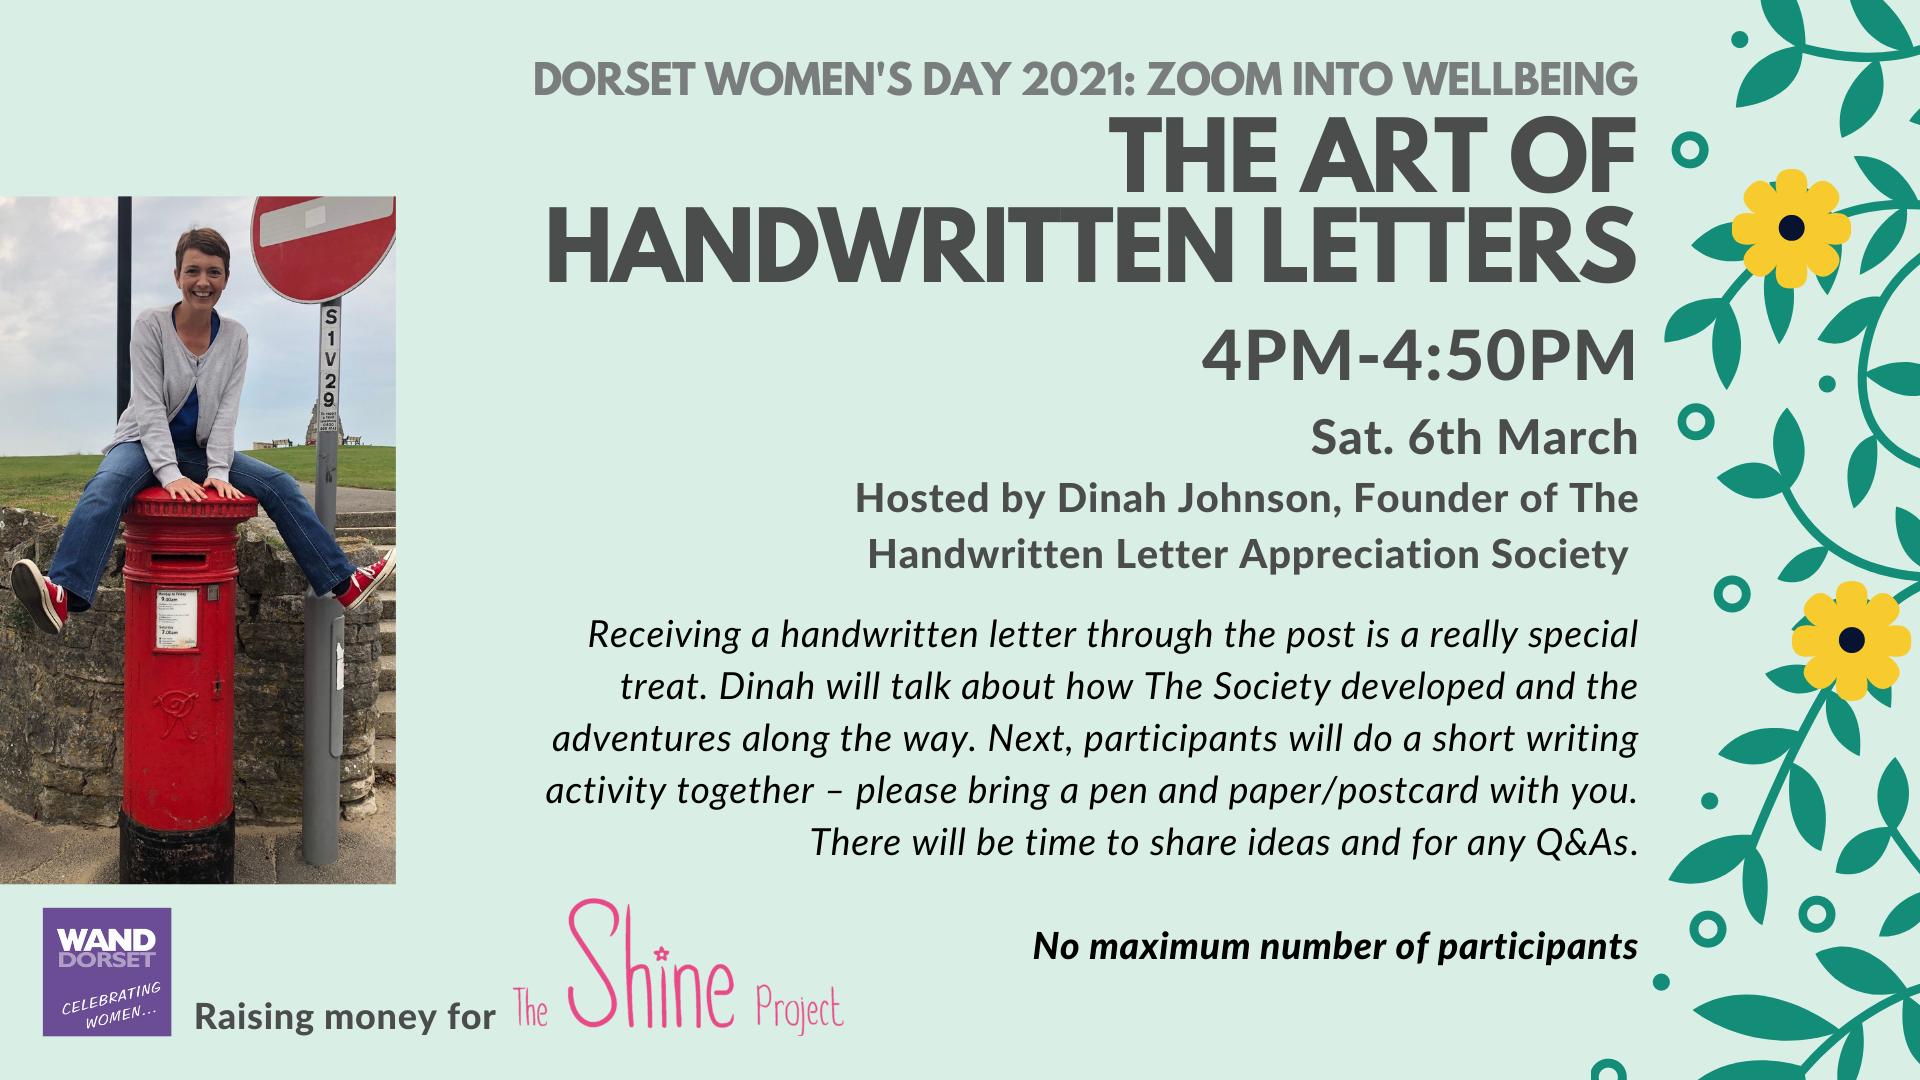 Dorset Women's Day 2021: The Art of Handwritten Letters